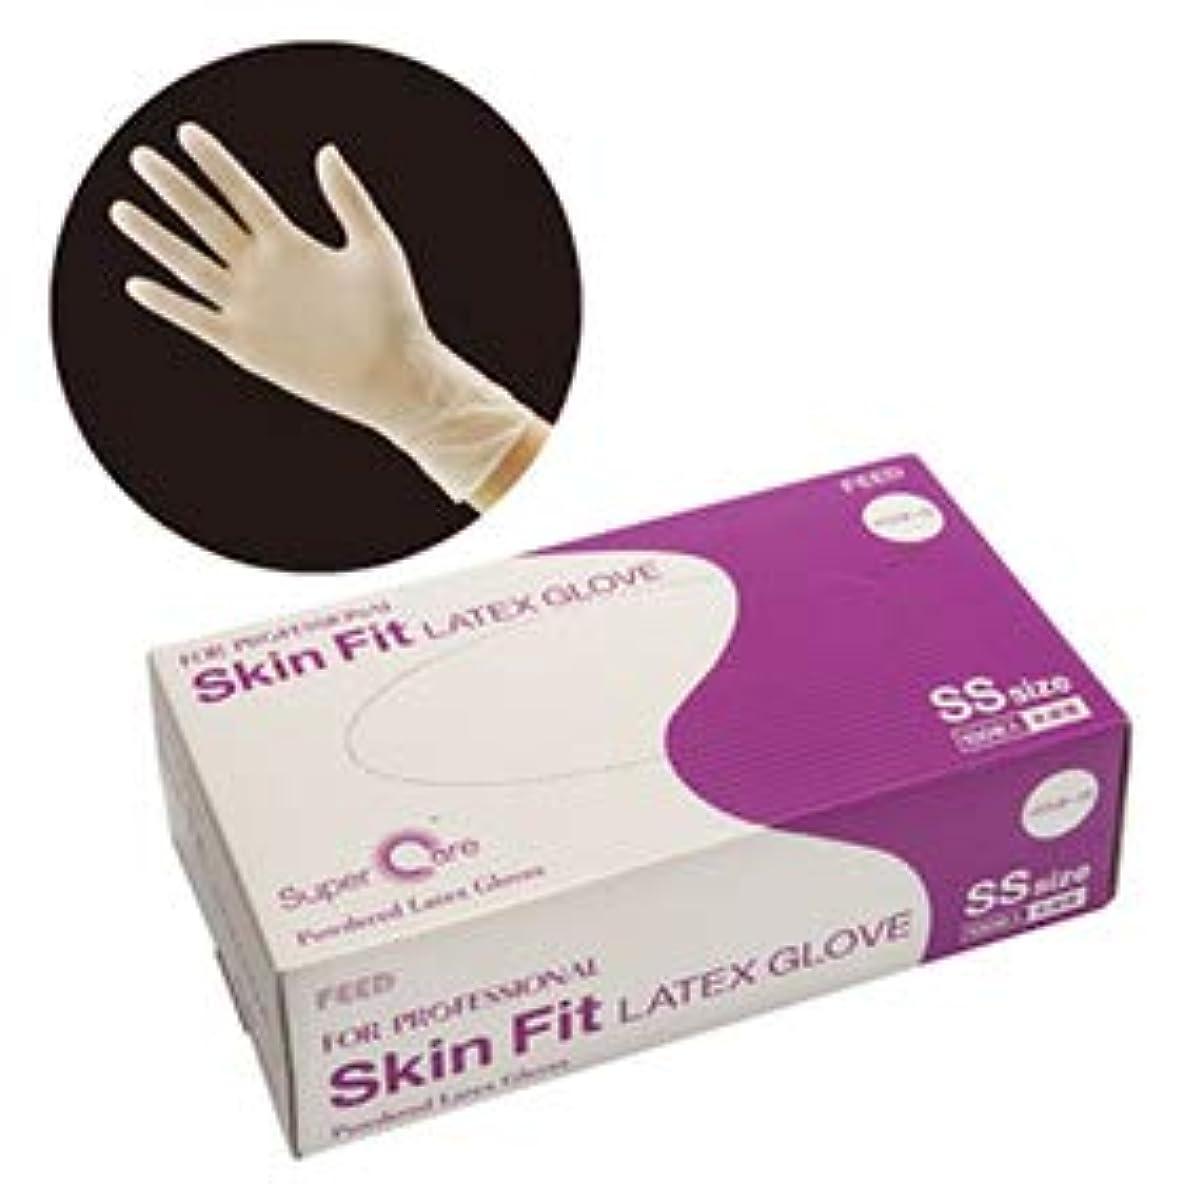 FEED(フィード) Skin Fit ラテックスグローブ パウダー付 SS カートン(100枚入×10ケース) (作業用)